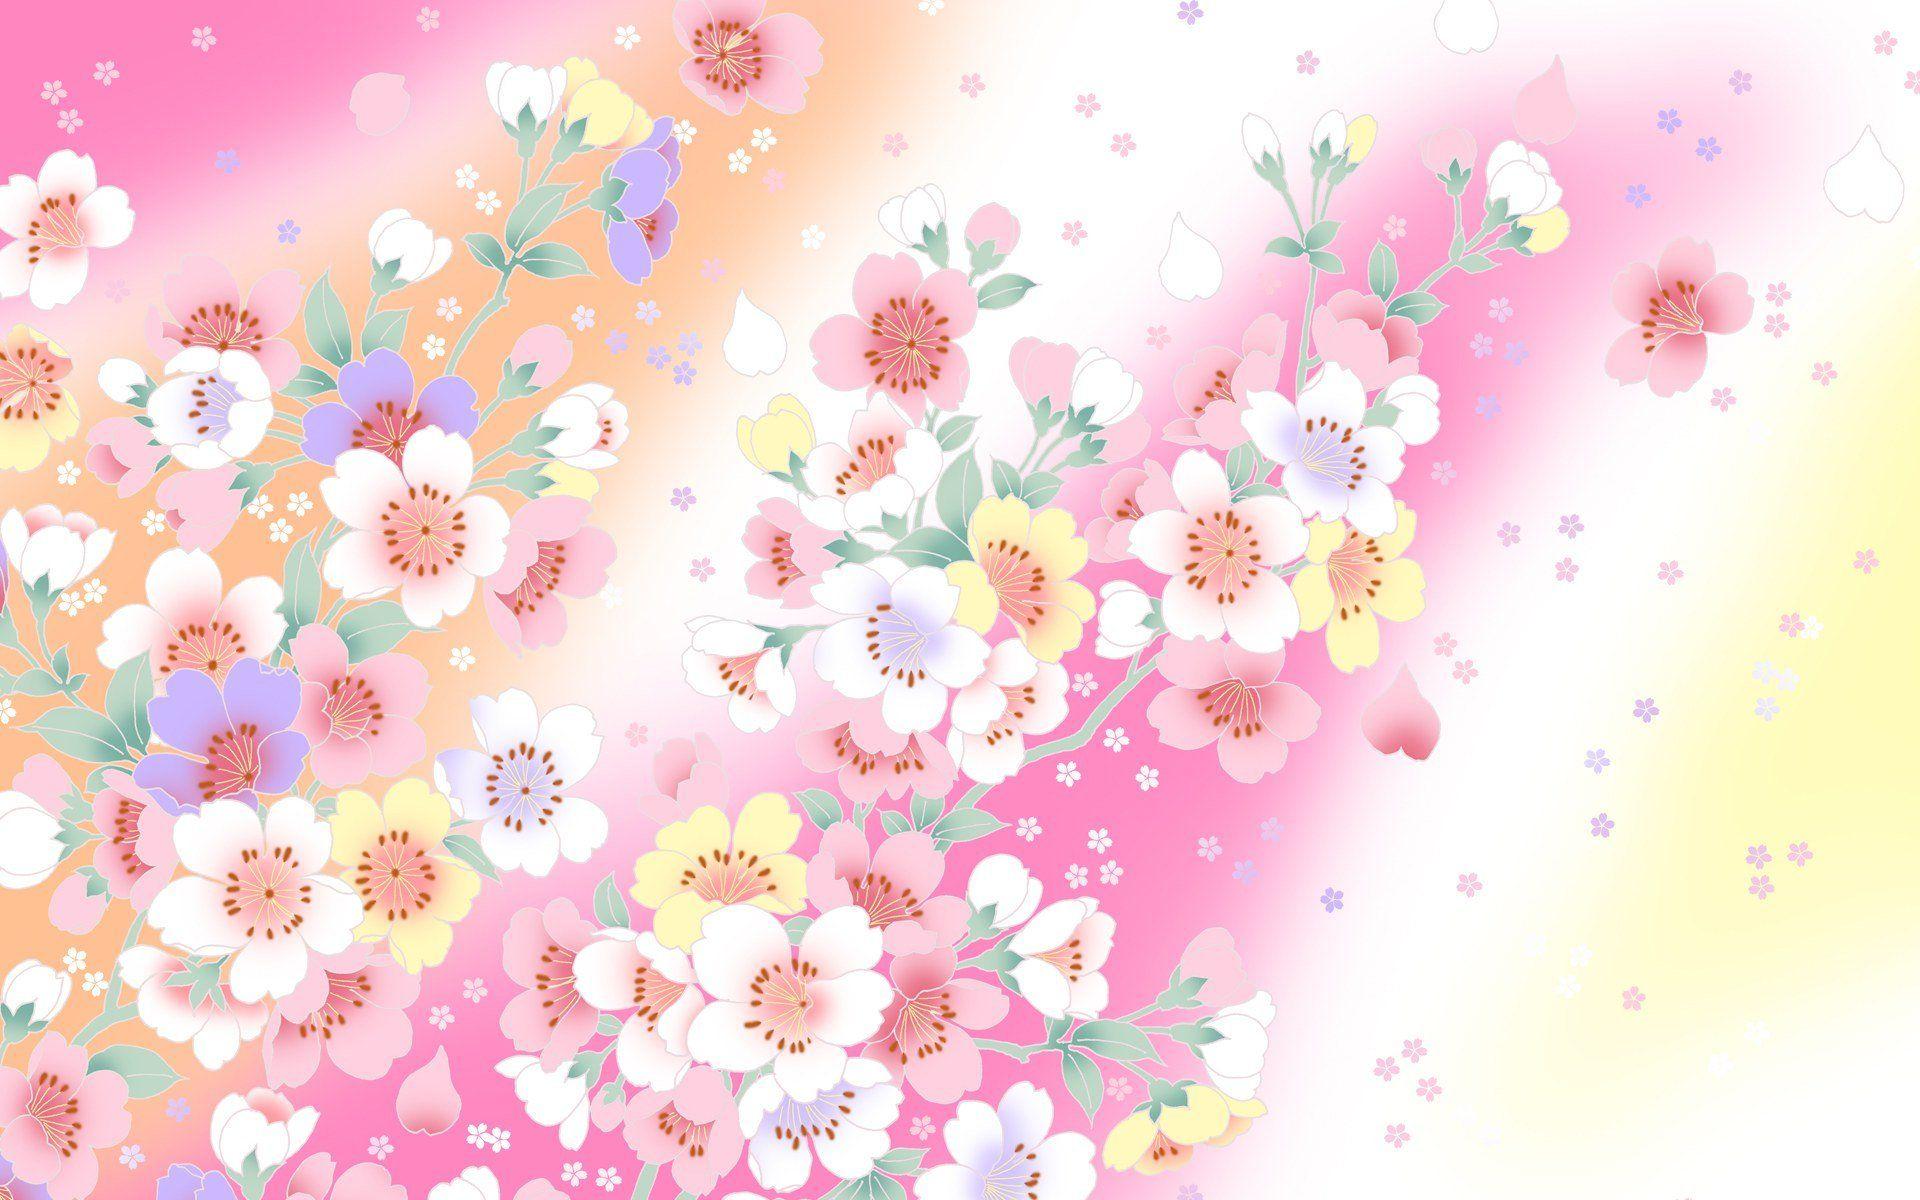 Pink flower designs wallpaper free jllsly oi pinterest pink flower designs wallpaper free jllsly mightylinksfo